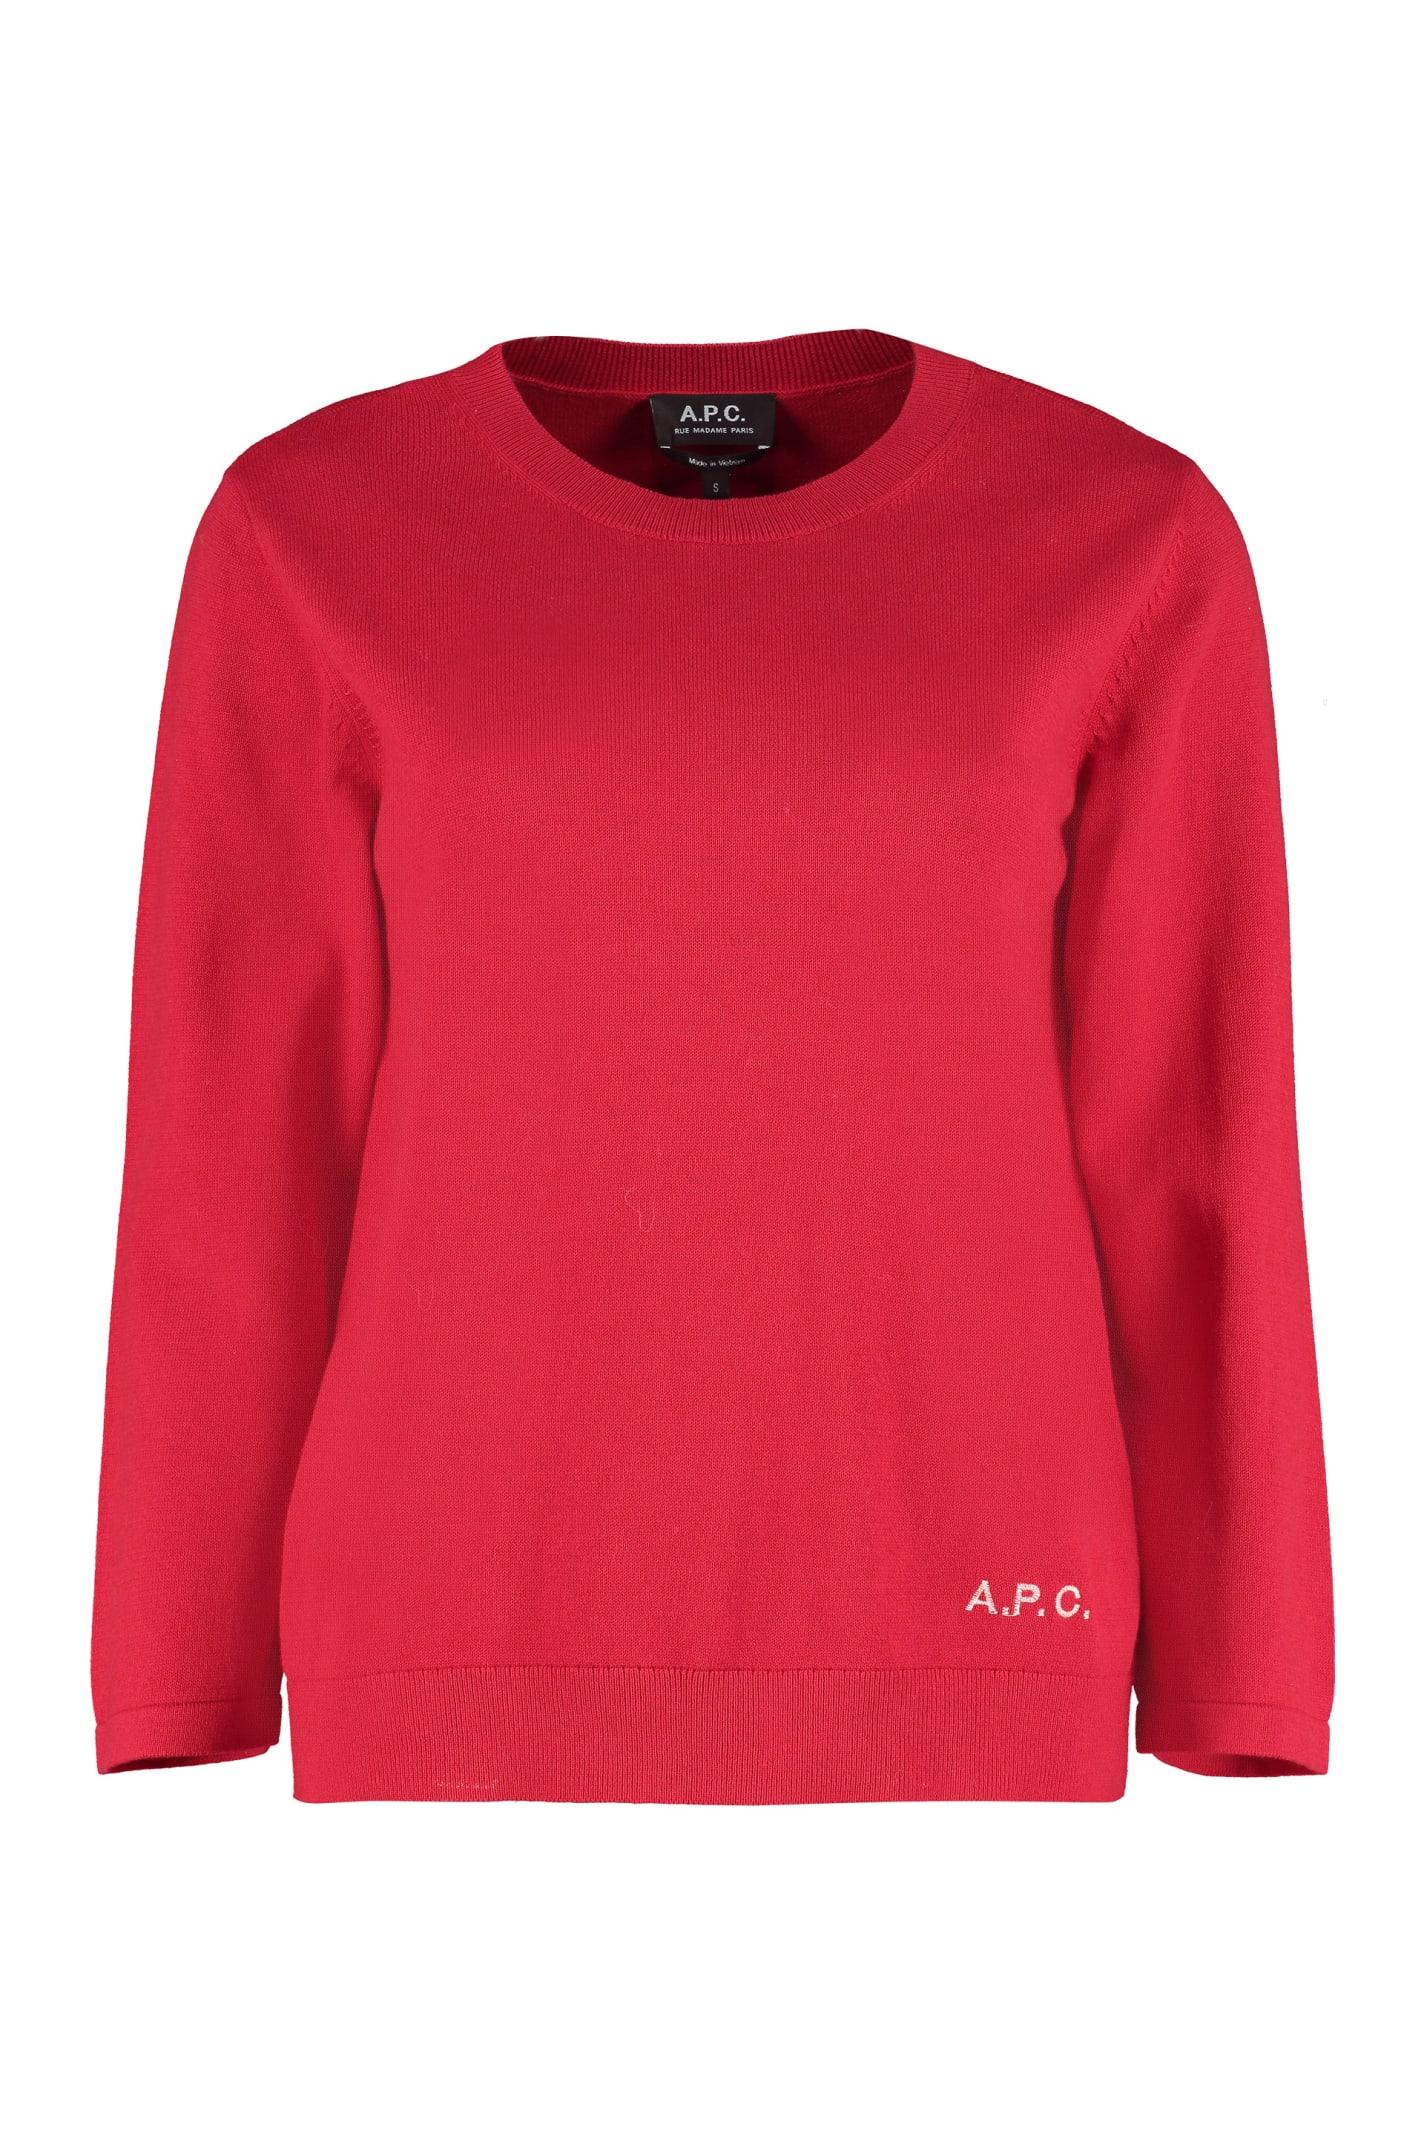 A.P.C. Cotton Blend Crew-neck Sweater